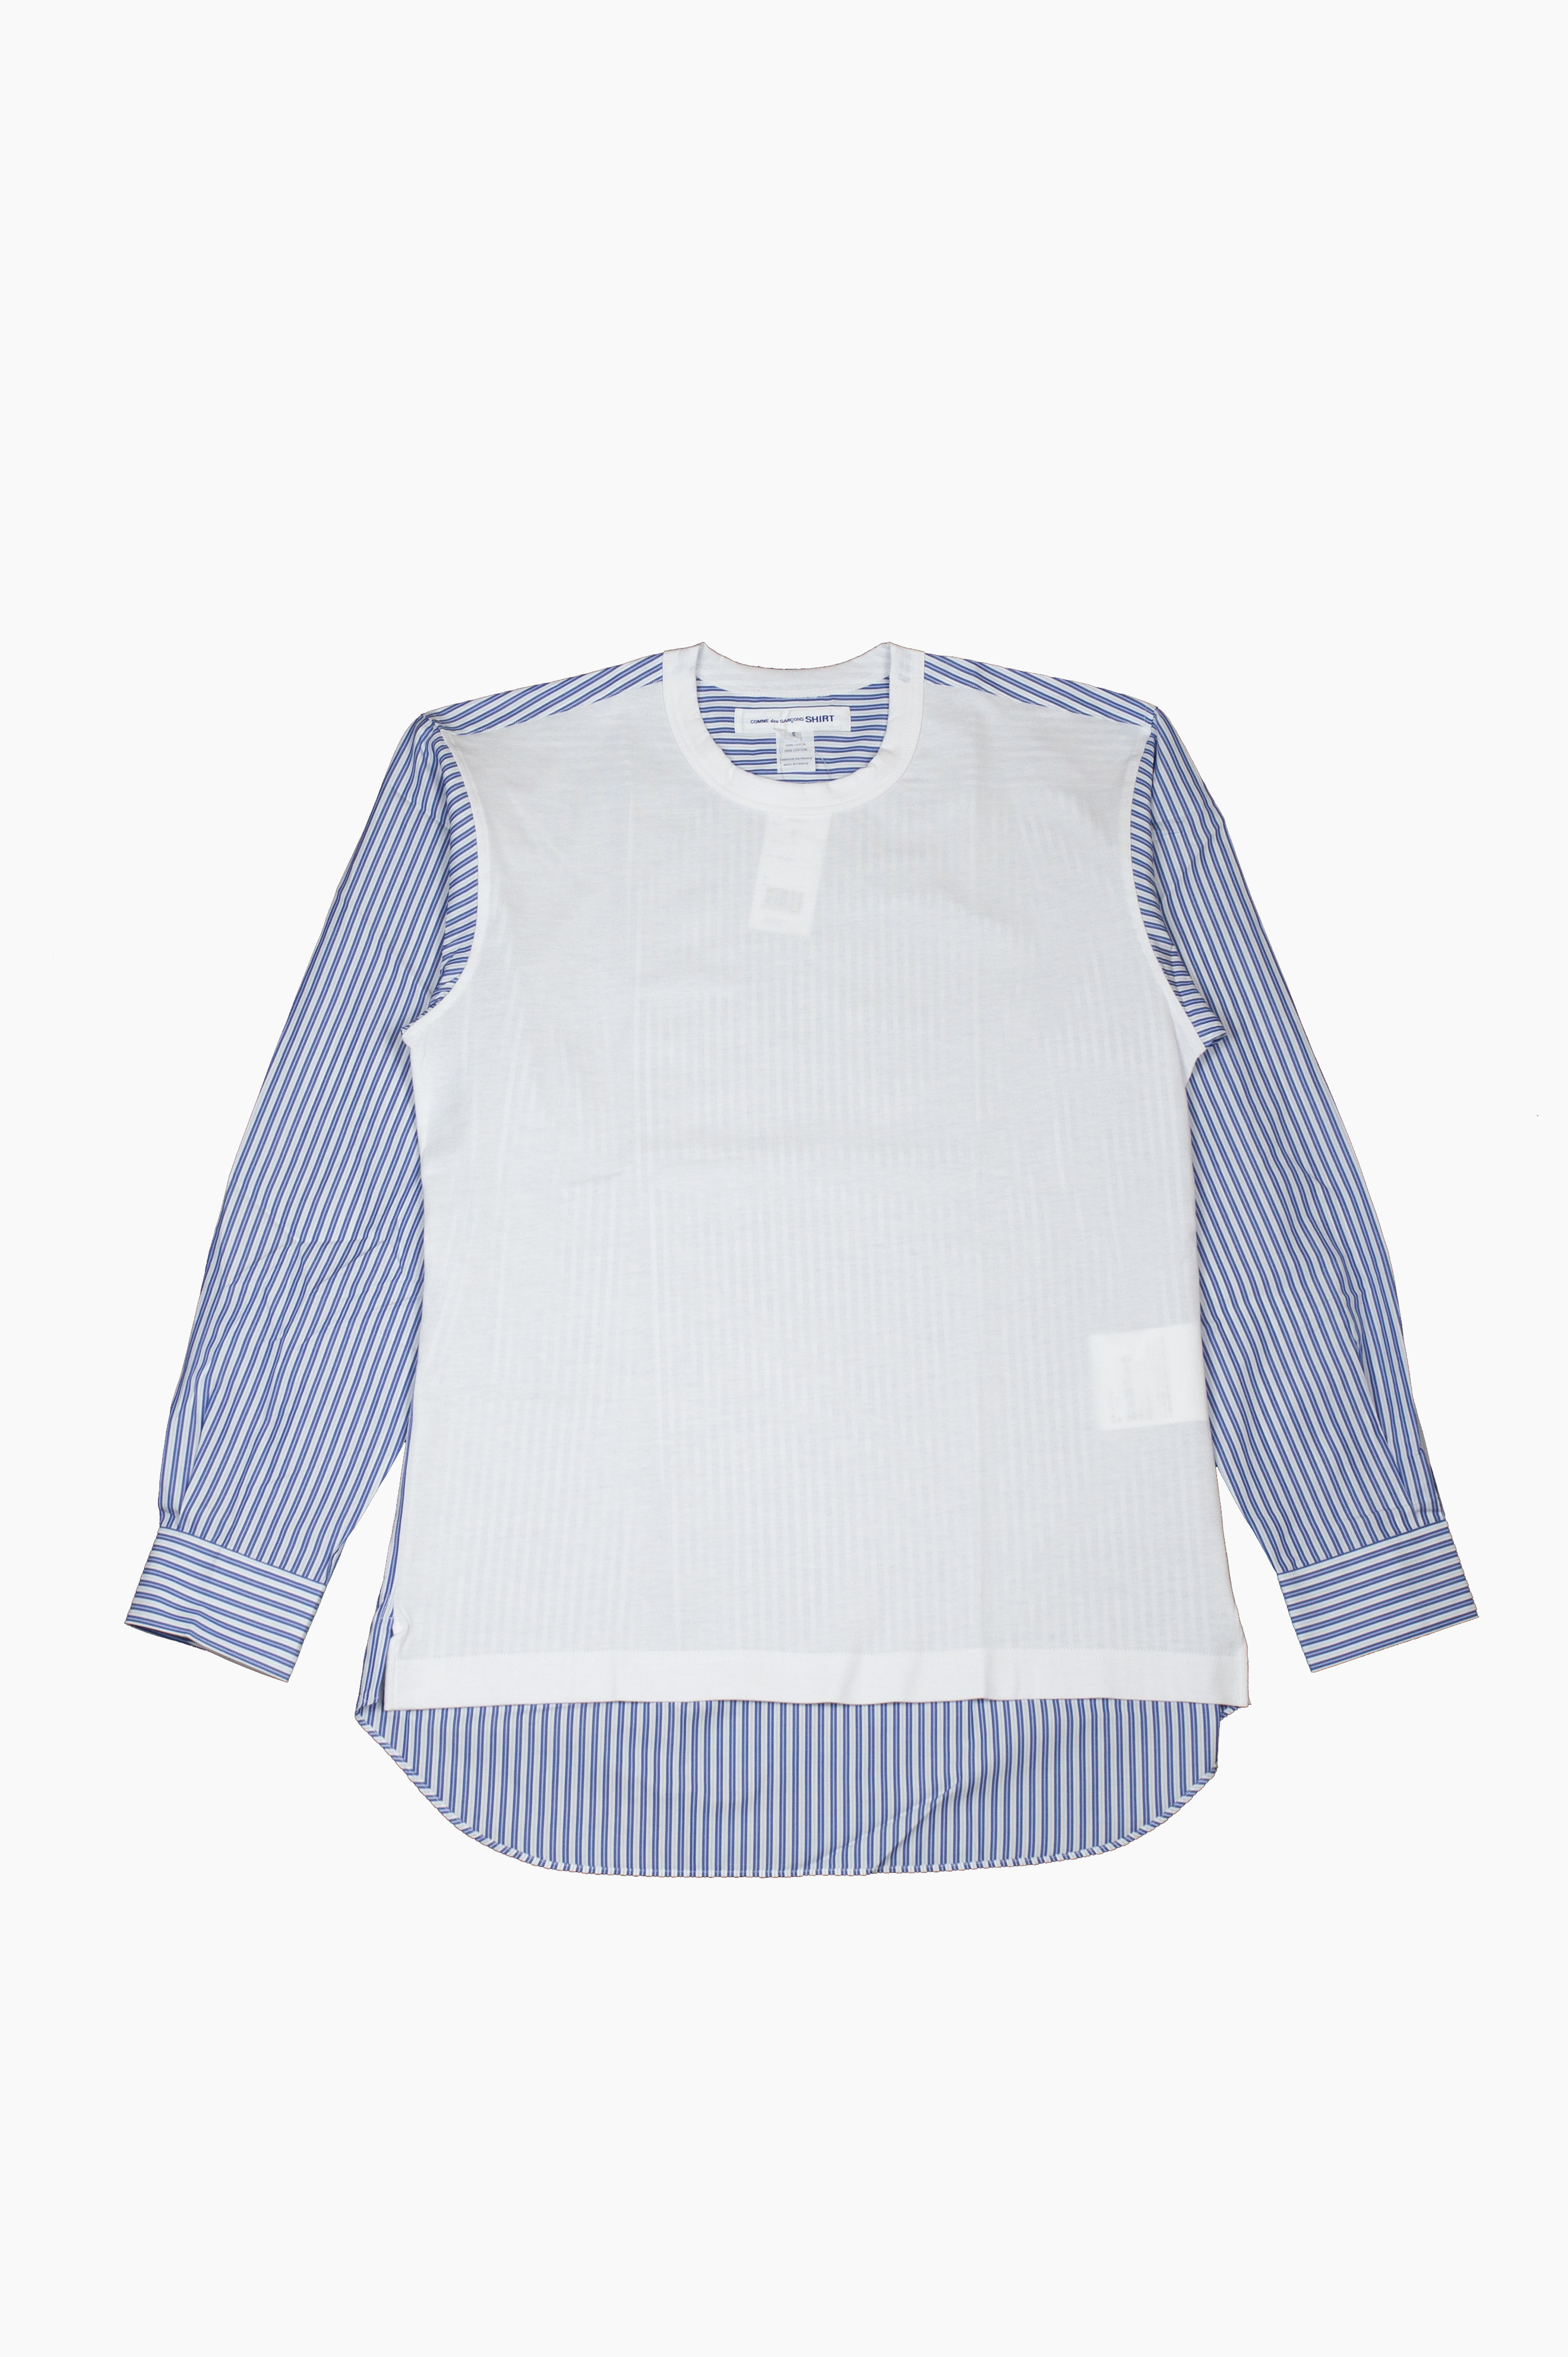 T-Shirt/Shirt White/Blue